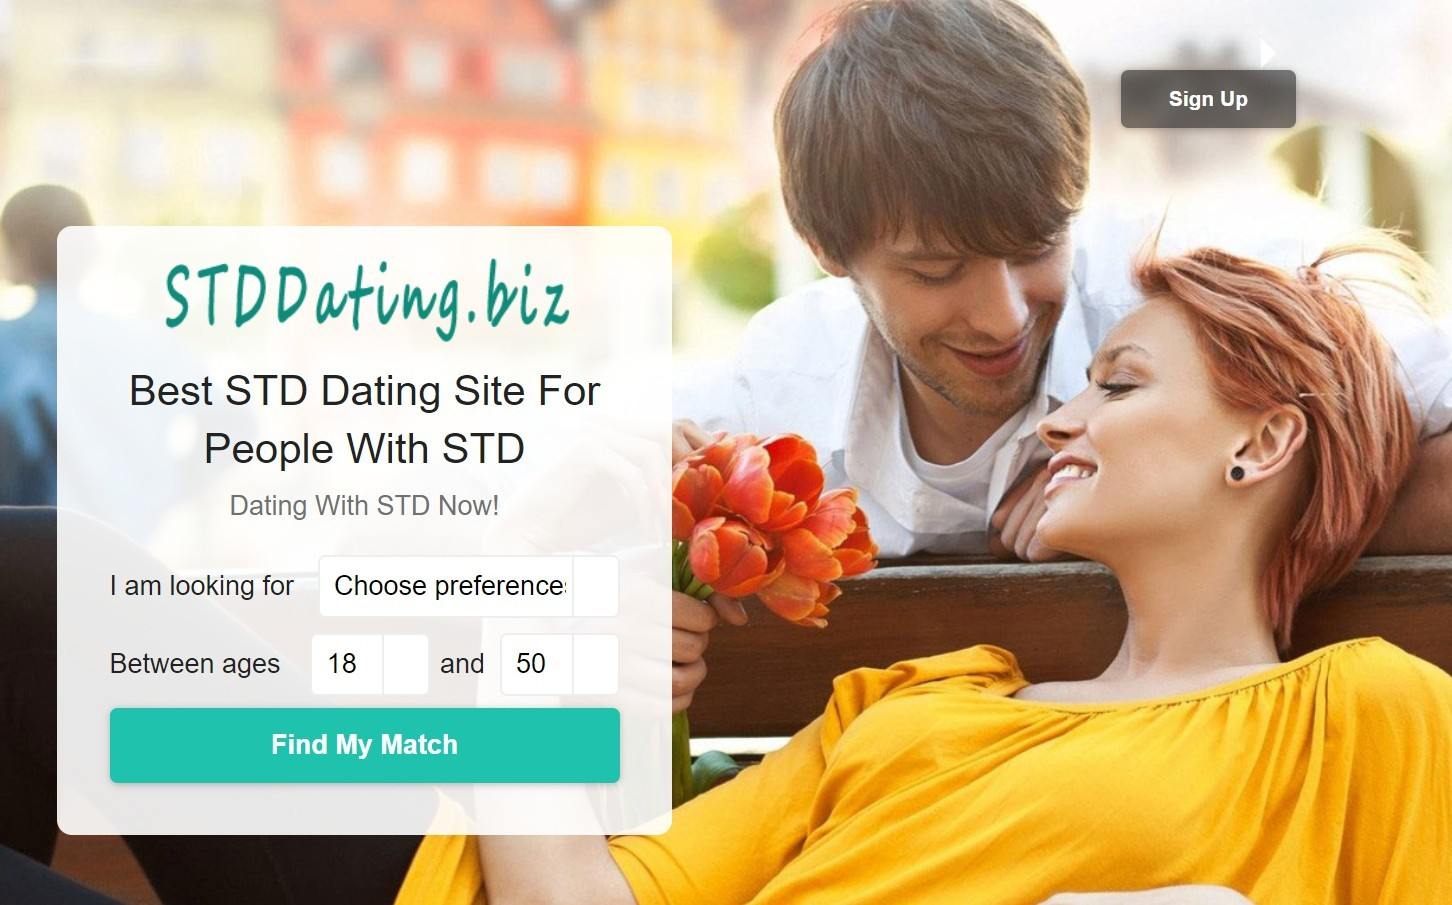 STD match datingAmoureux dating